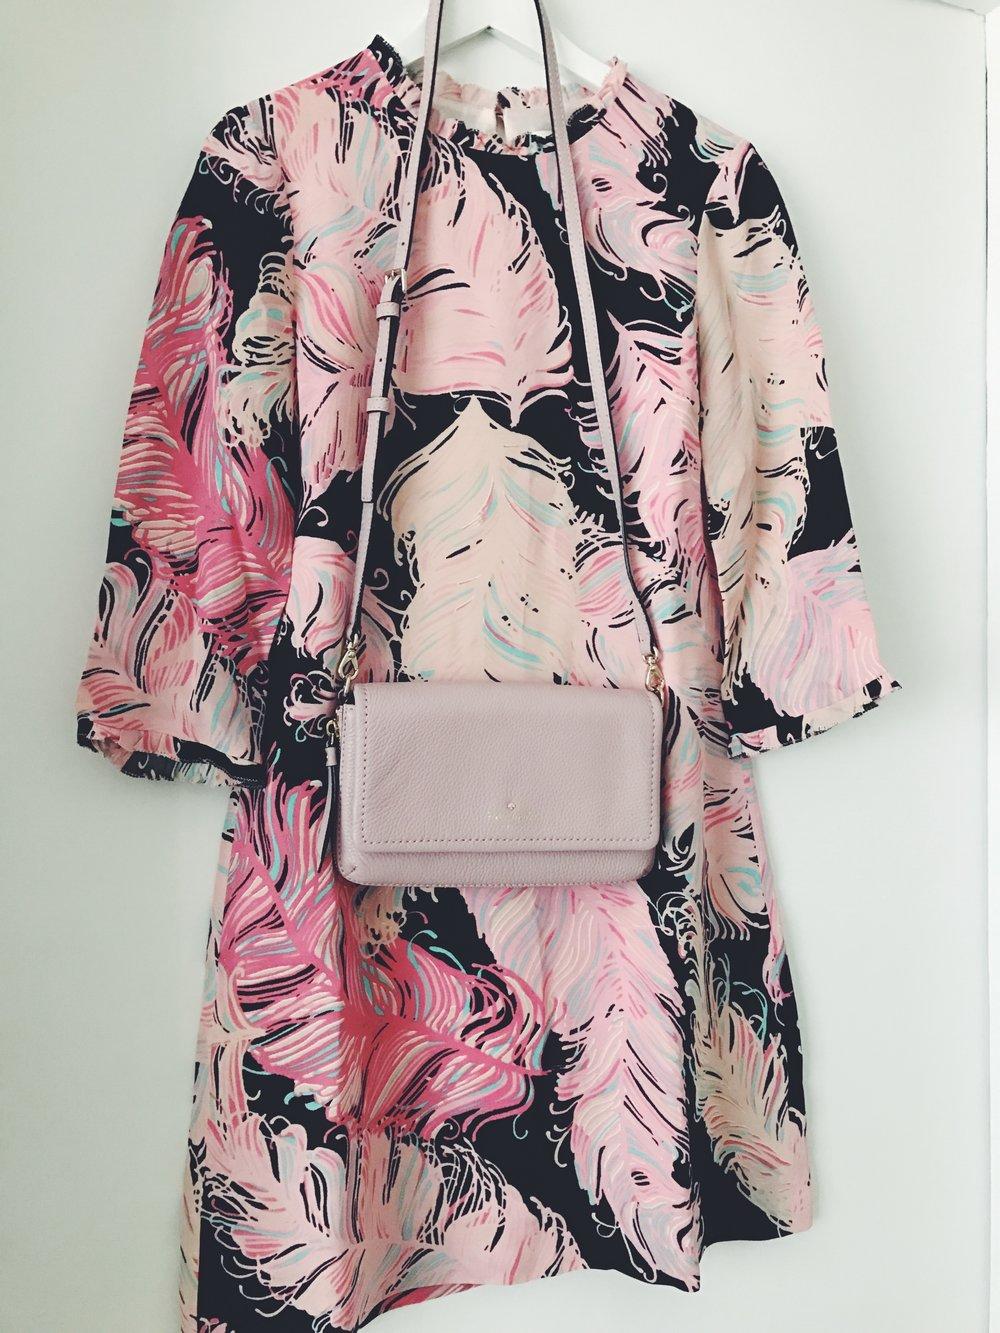 Kate Spade mekko ja laukku